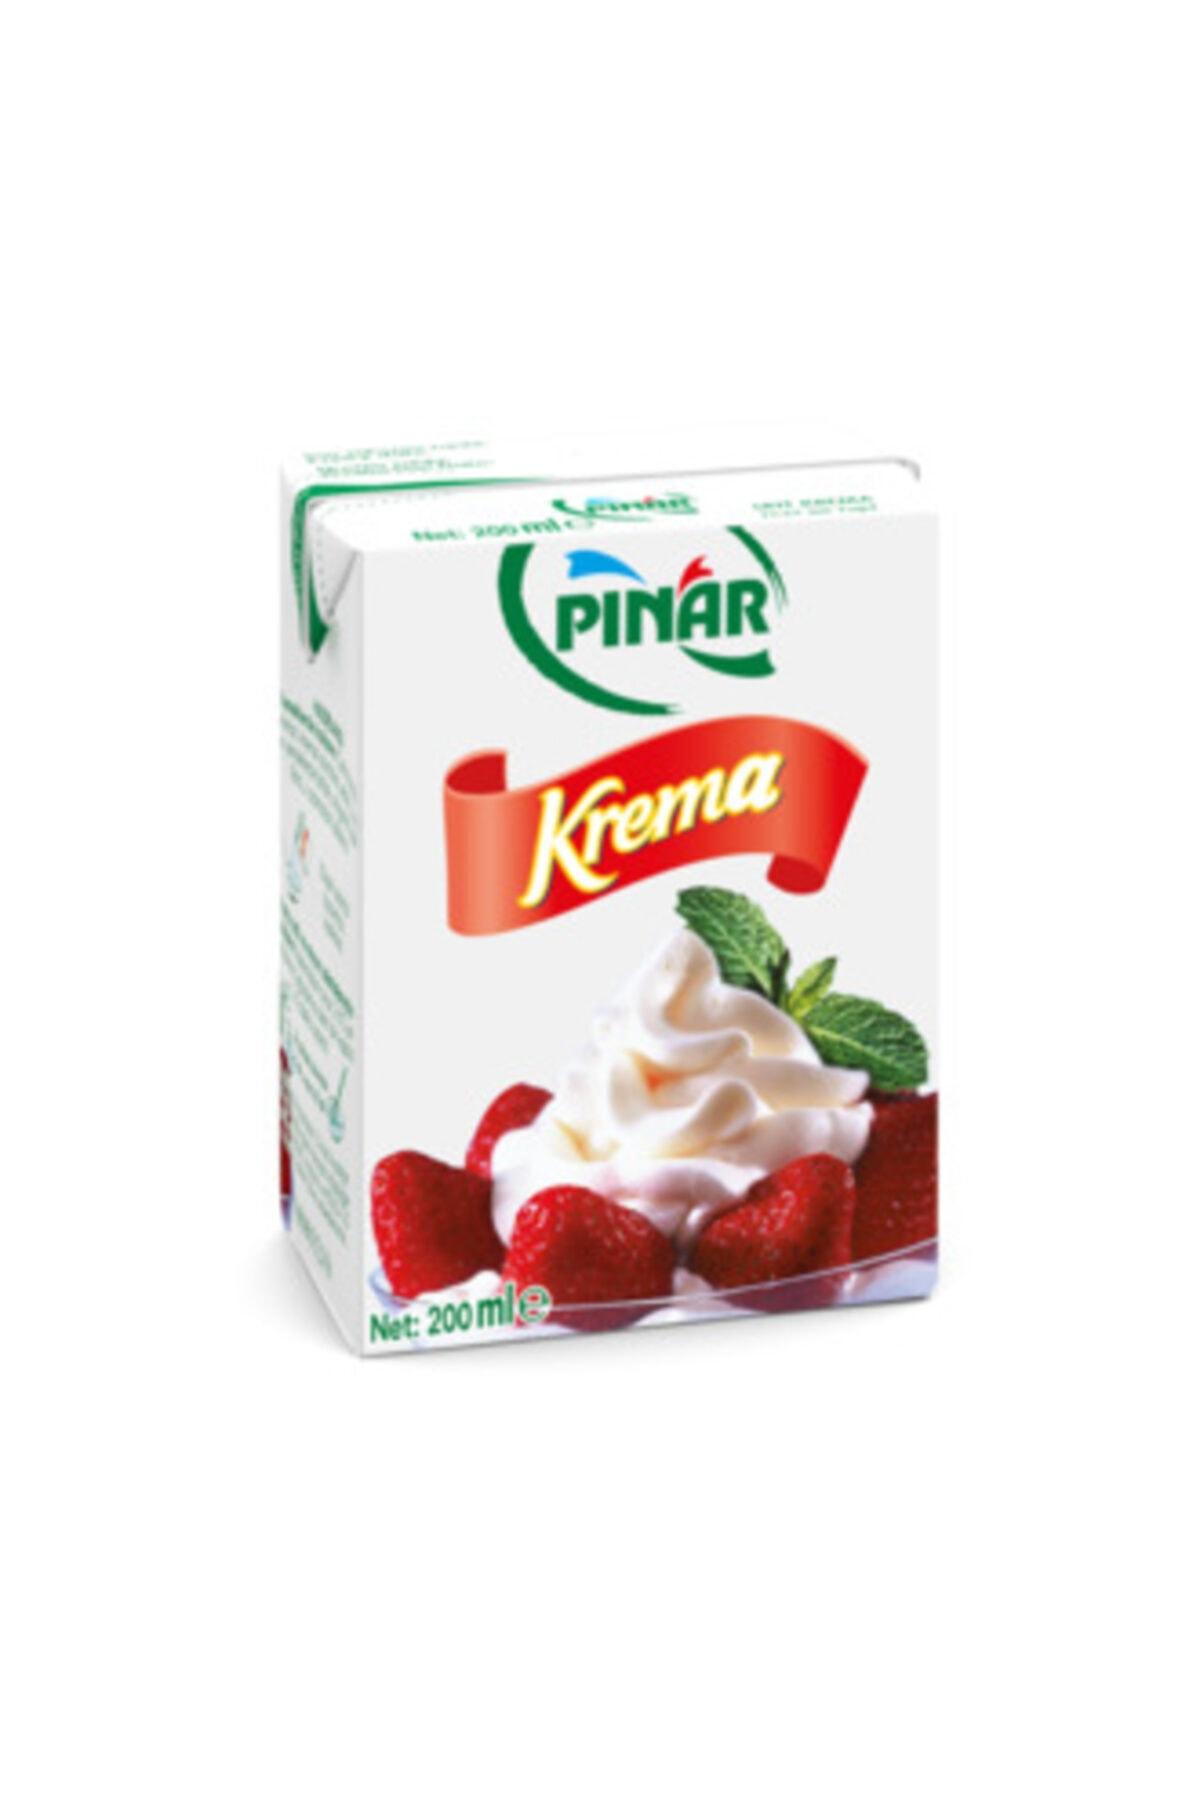 Pınar Krema 200 Ml 1